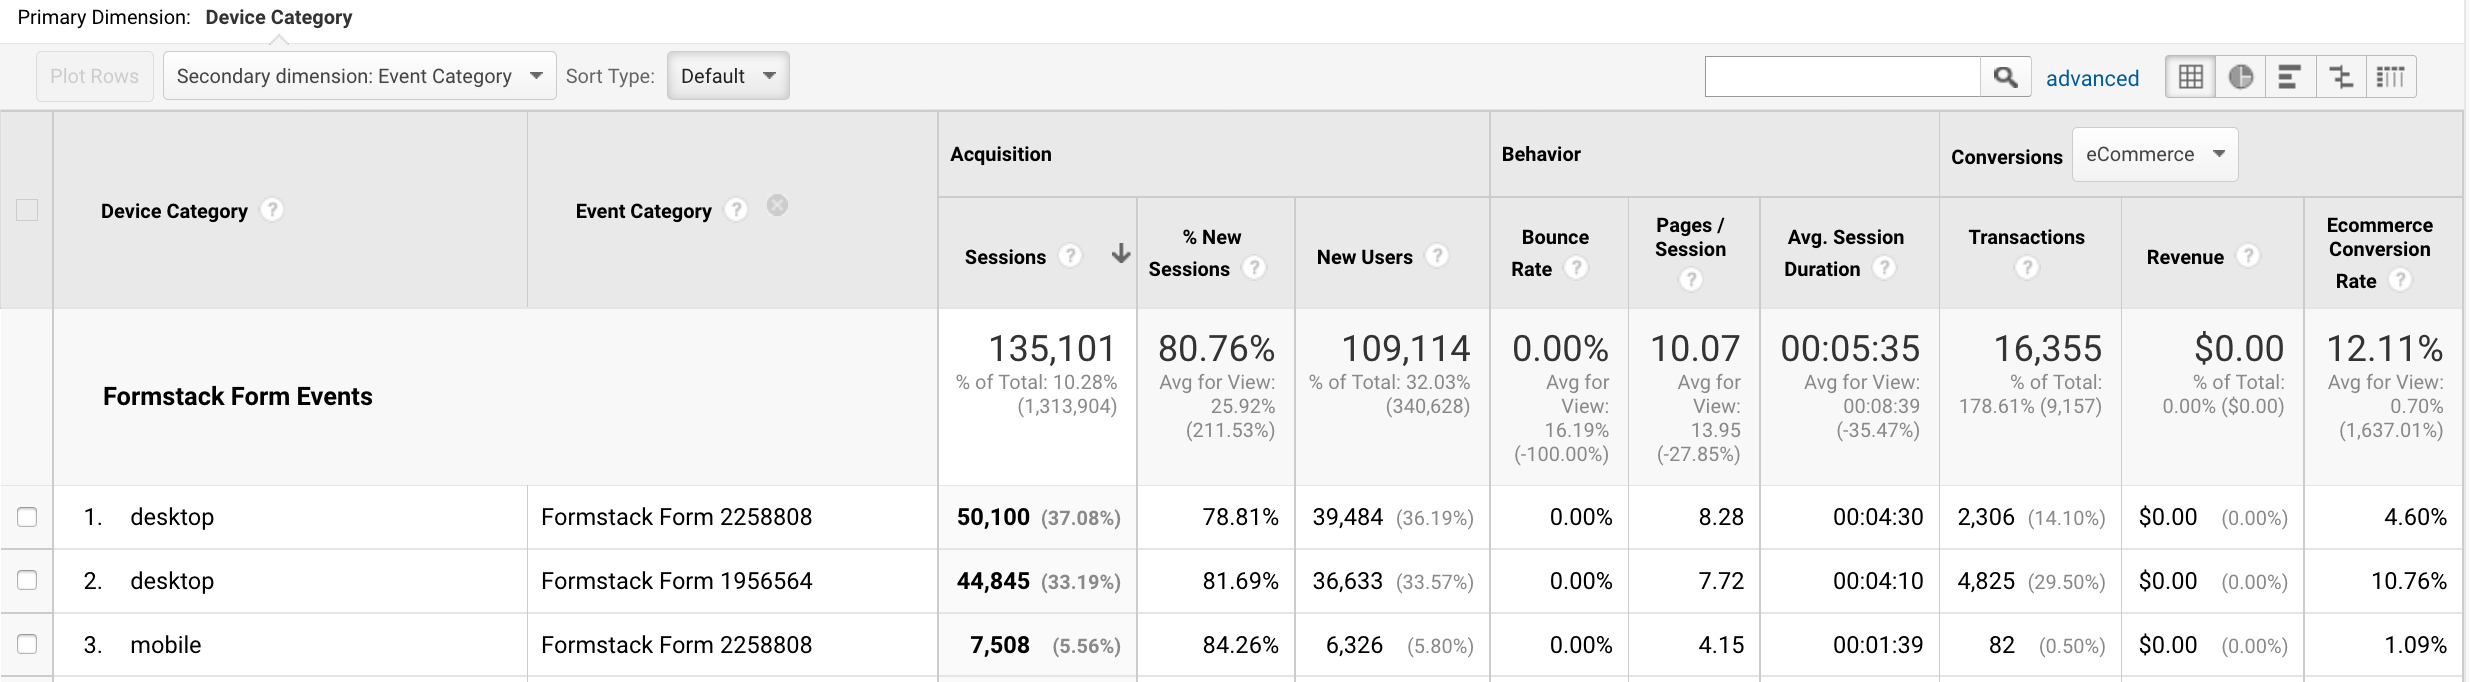 Formstack Form Details with Google Analytics Plugin